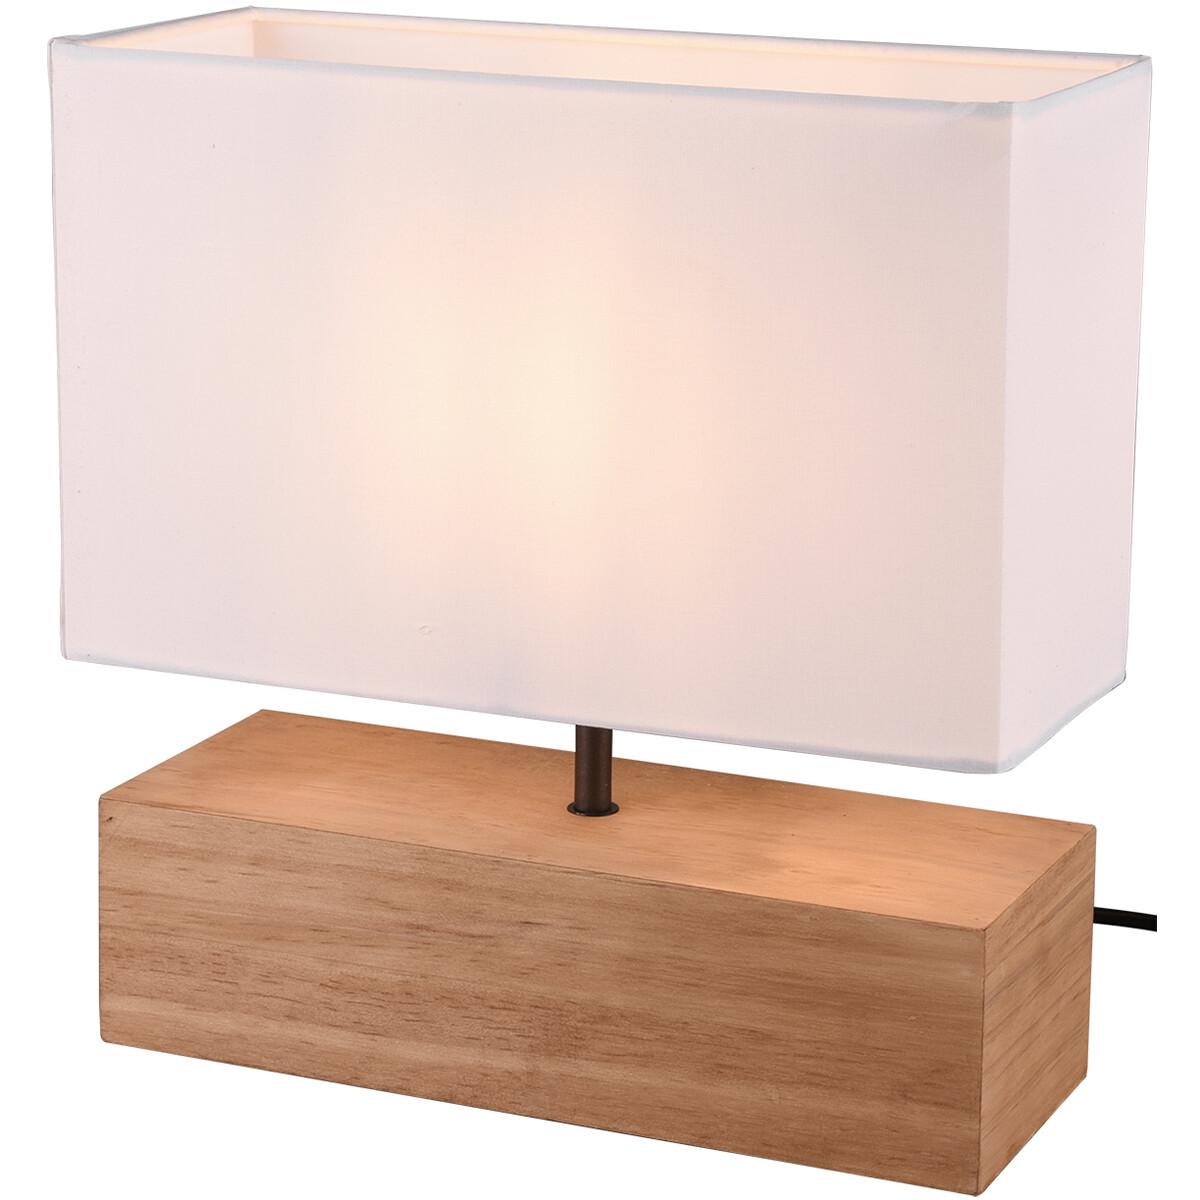 LED Tafellamp - Tafelverlichting - Trion Wooden - E27 Fitting - Rechthoek - Mat Wit - Hout